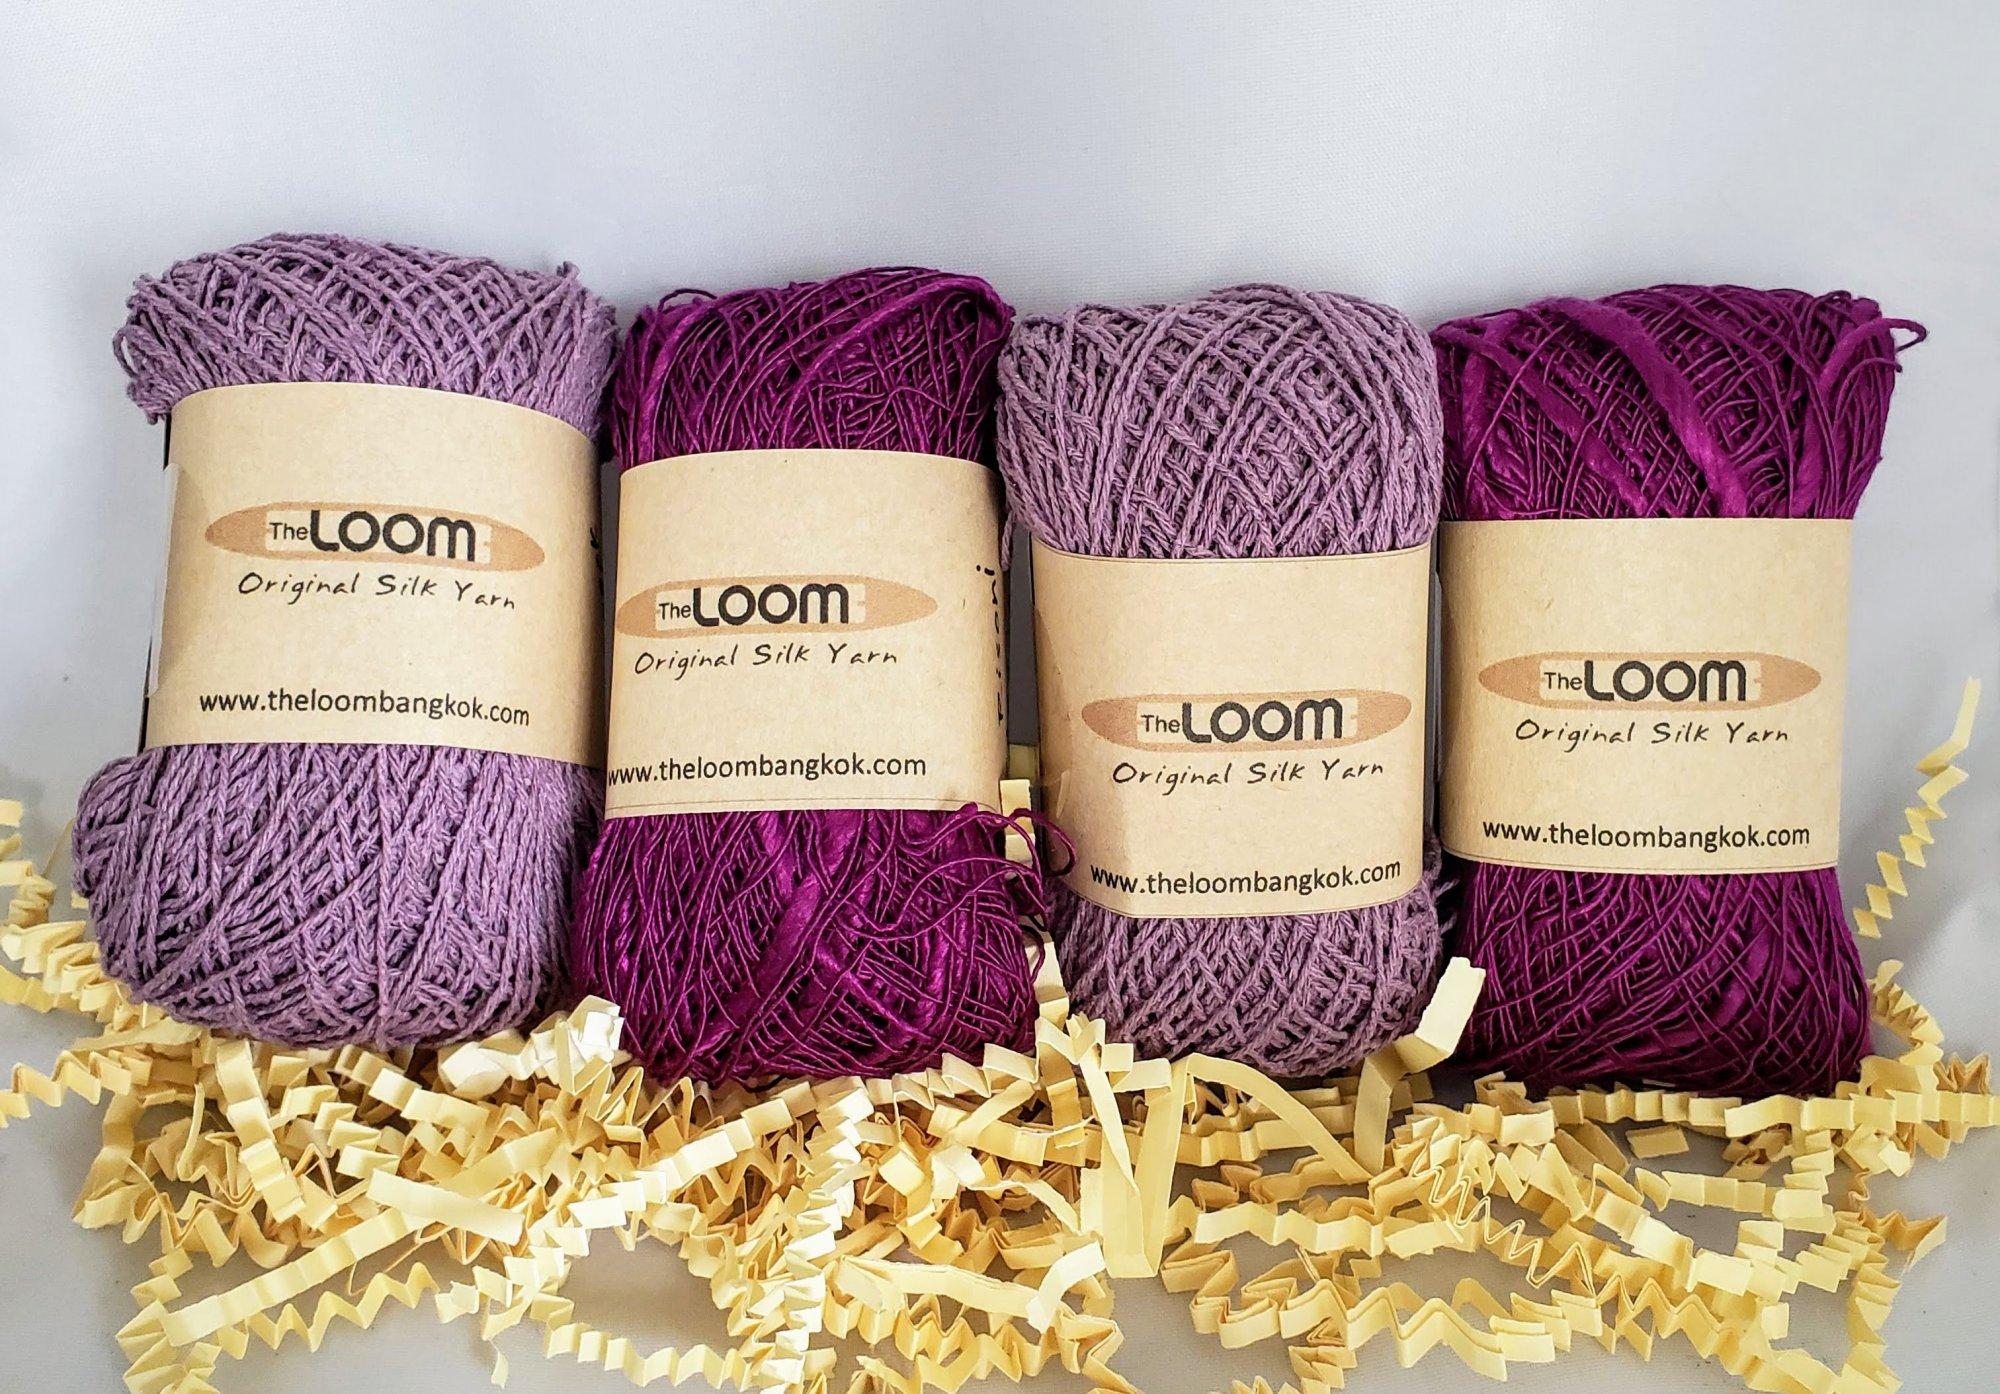 Loom Manistique Scarf Kit